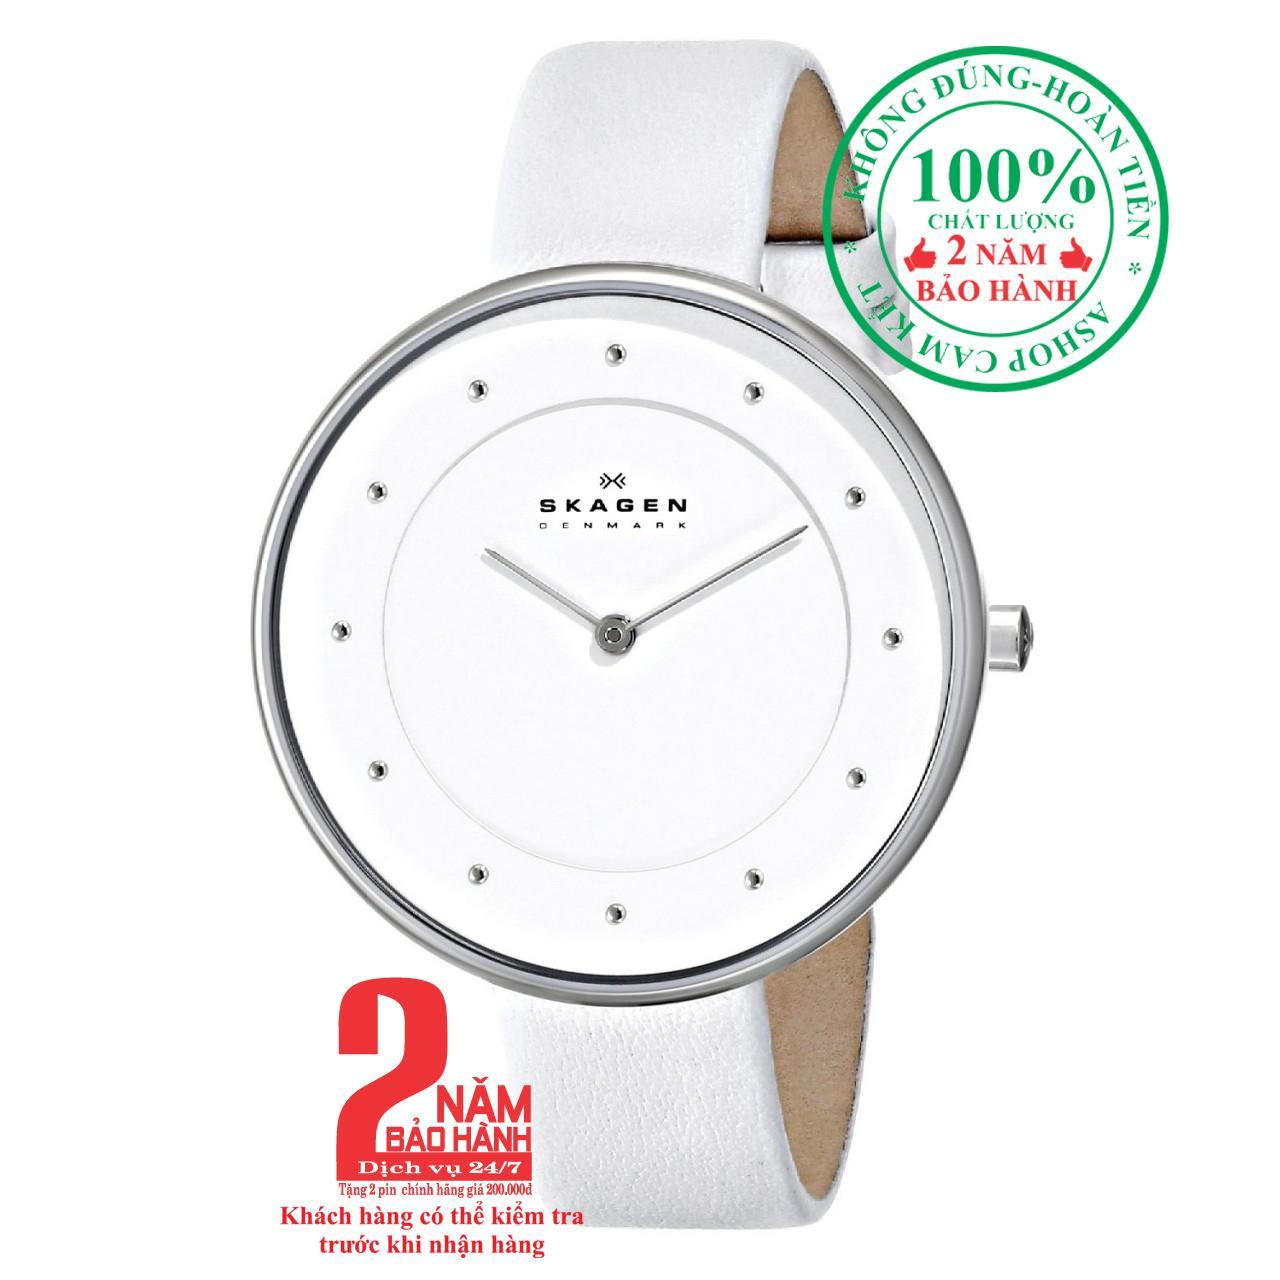 Đồng hồ nữ Skagen SKW2136, màu thép trắng(Stainless Steel), mặt trắng (White), dây da thật cao cấp, size 38mm - Model: SKW2136 bán chạy